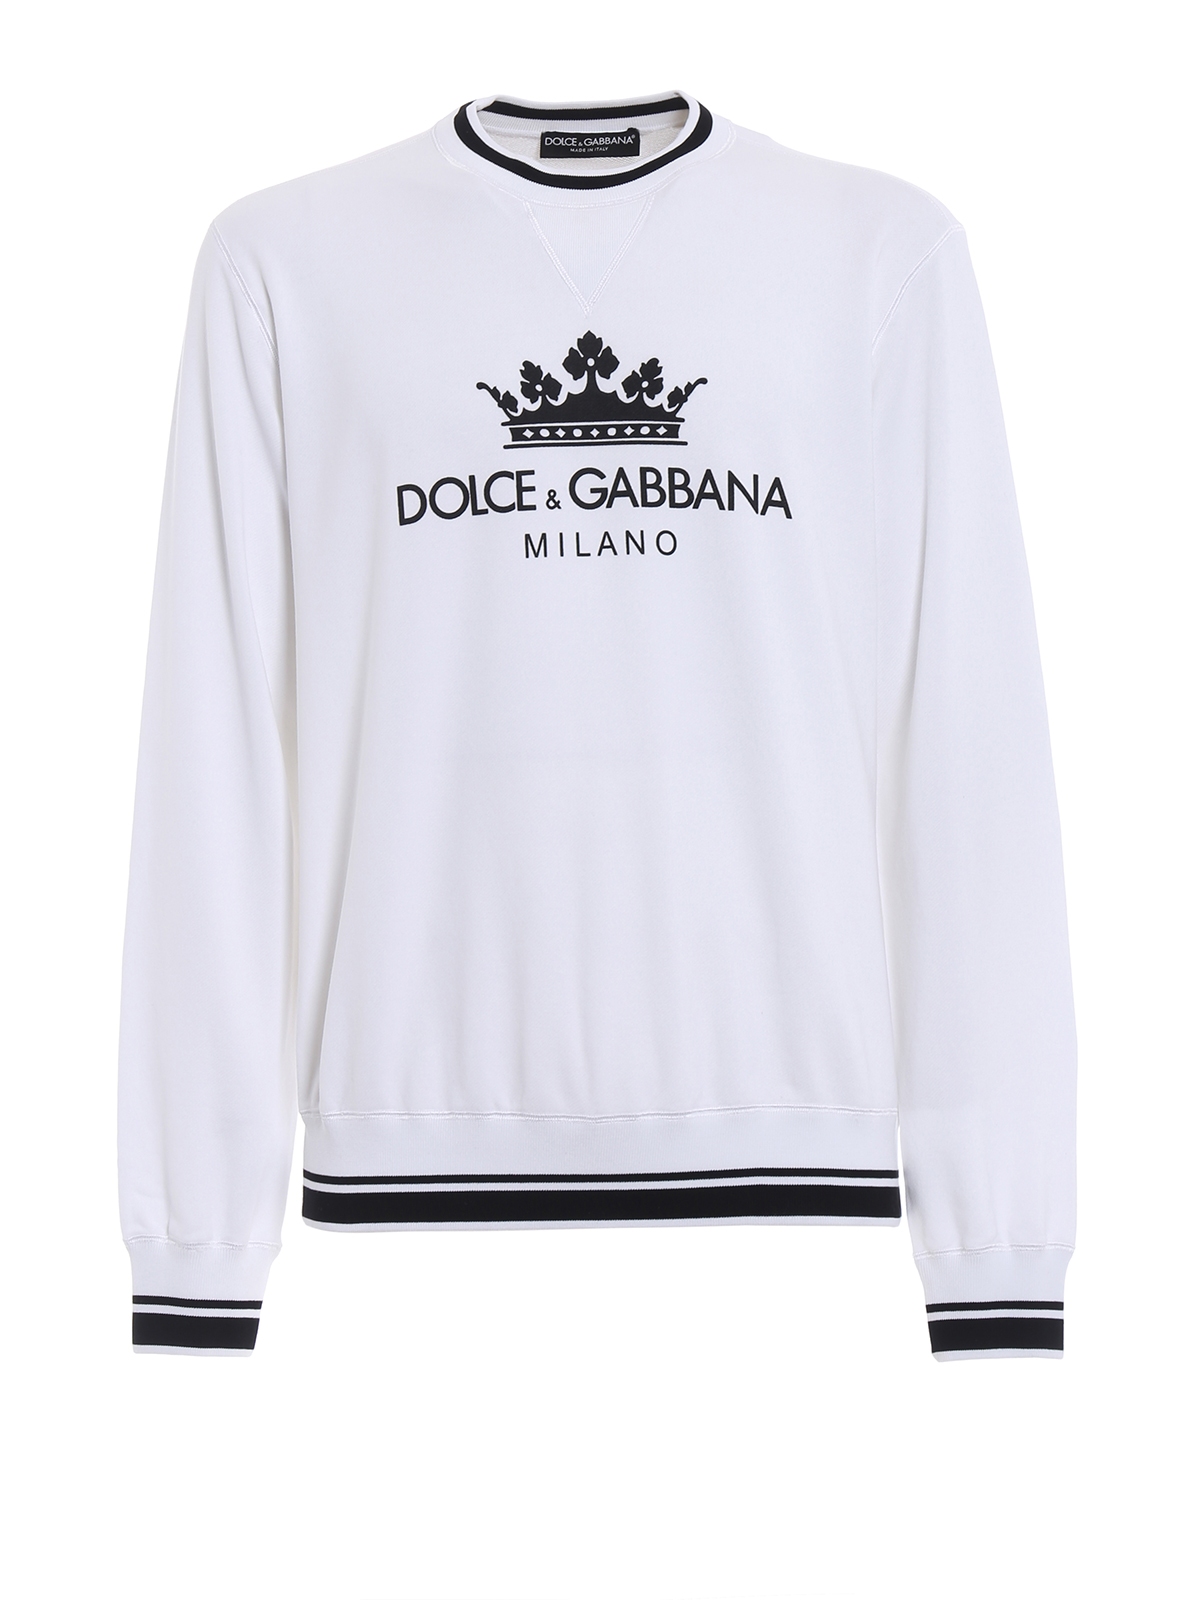 Gabbana Logomania Sweat Dolce Pulls Shirts Sweatshirts amp; U8xqxfp